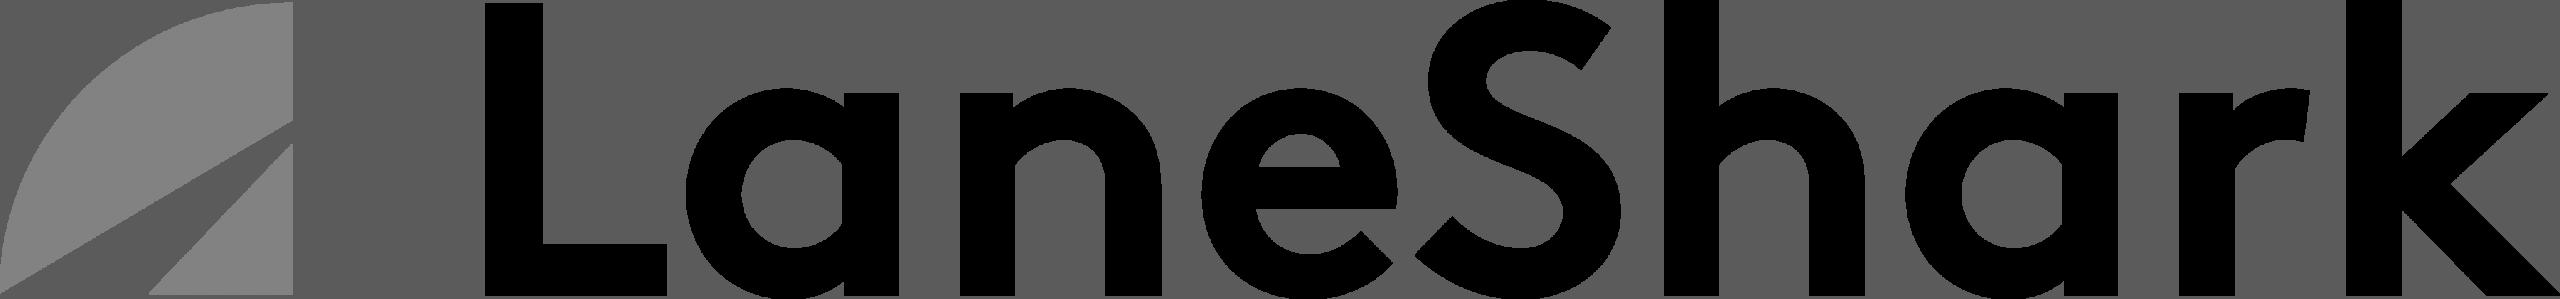 lane shark logo